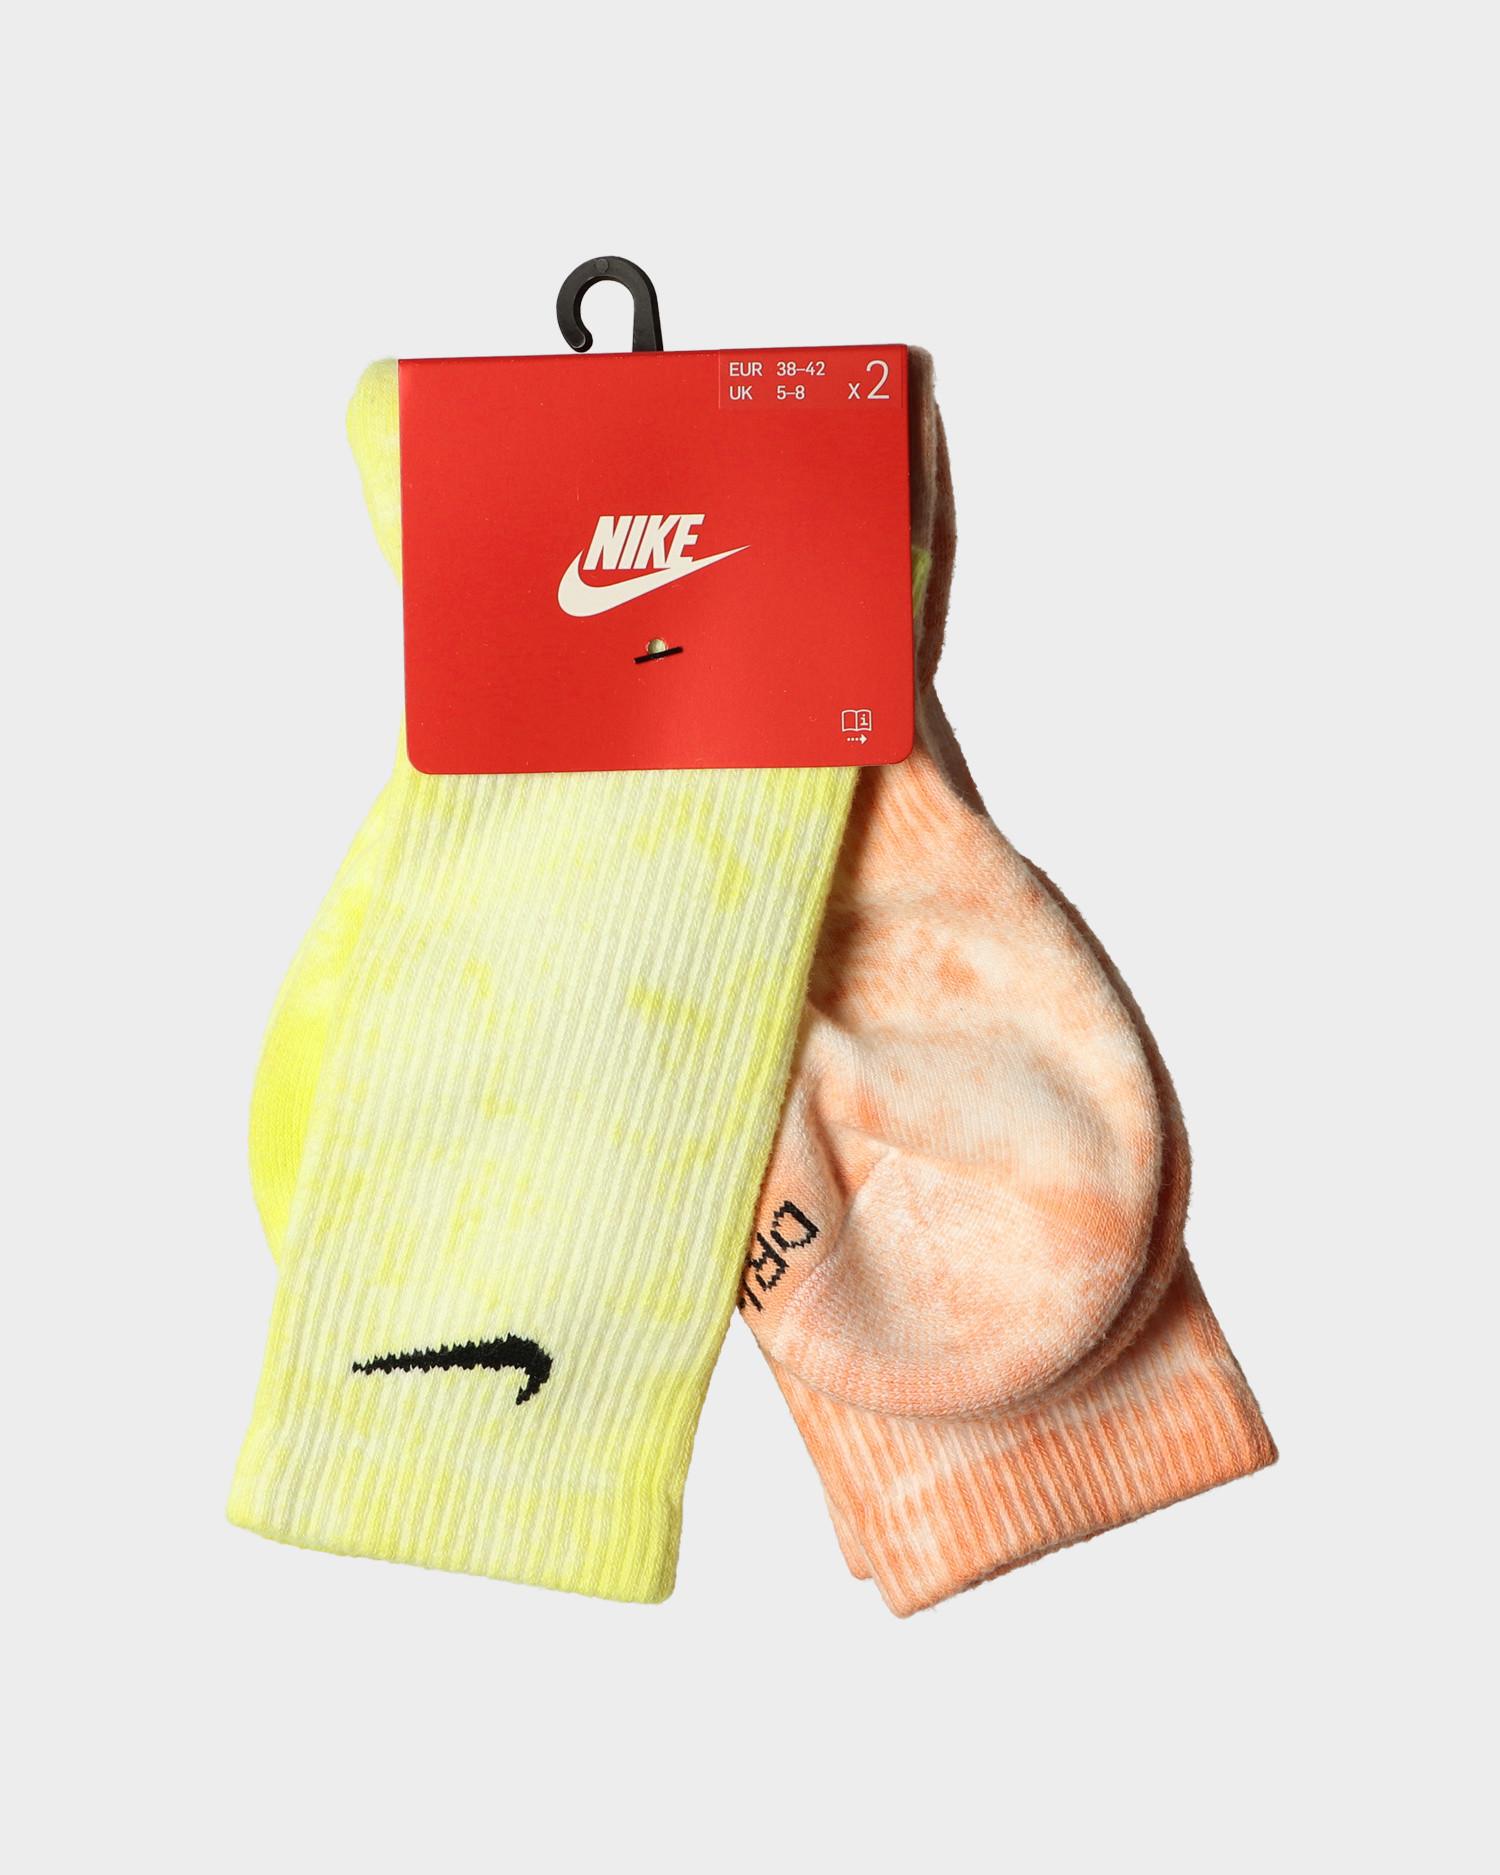 Nike Everyday Plus Socks Multi Color Yellow/Orange